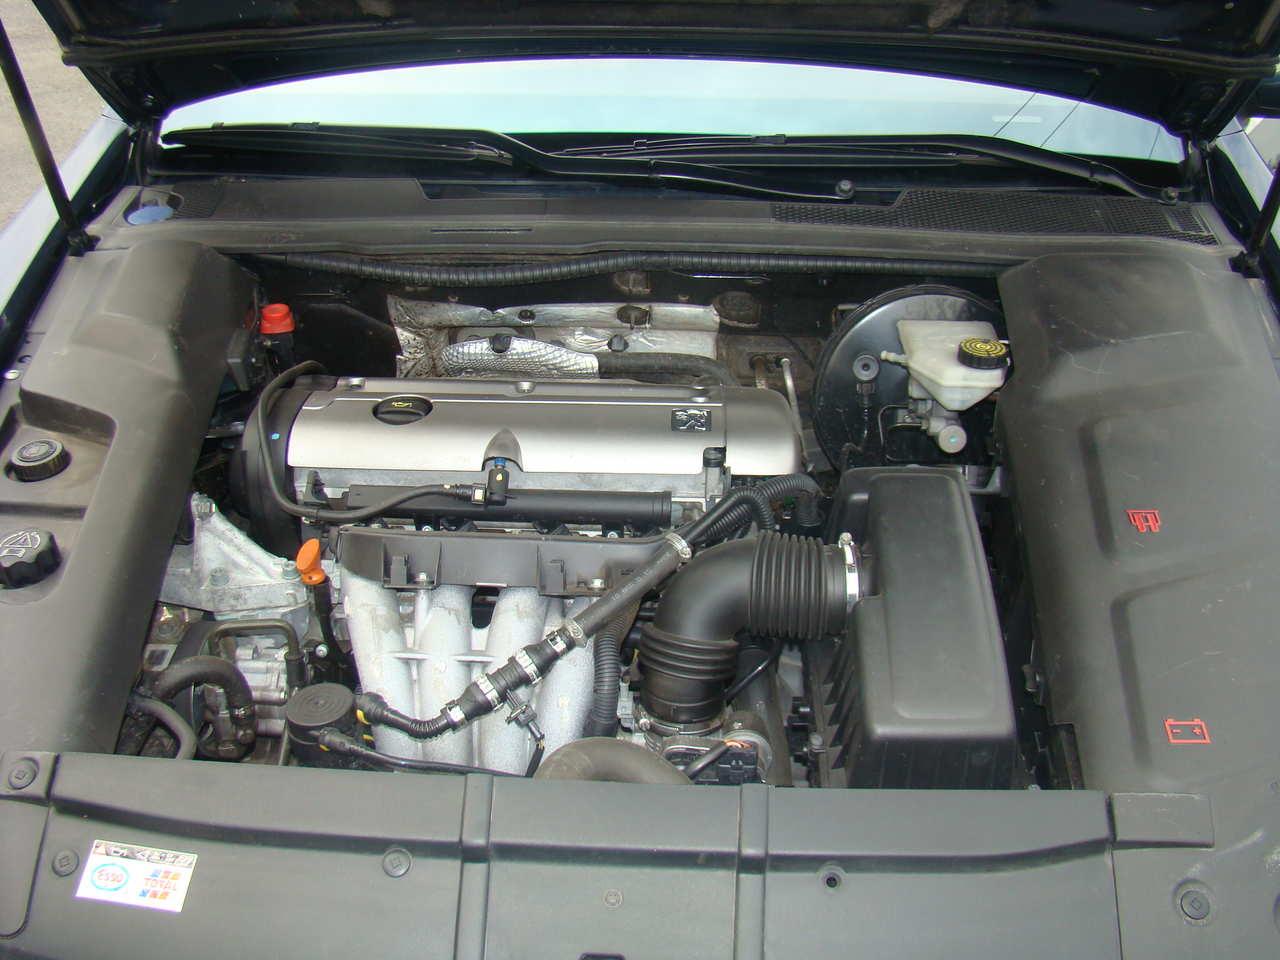 2001 Peugeot 607 Specs  Engine Size 2 2l   Fuel Type Gasoline  Drive Wheels Ff  Transmission